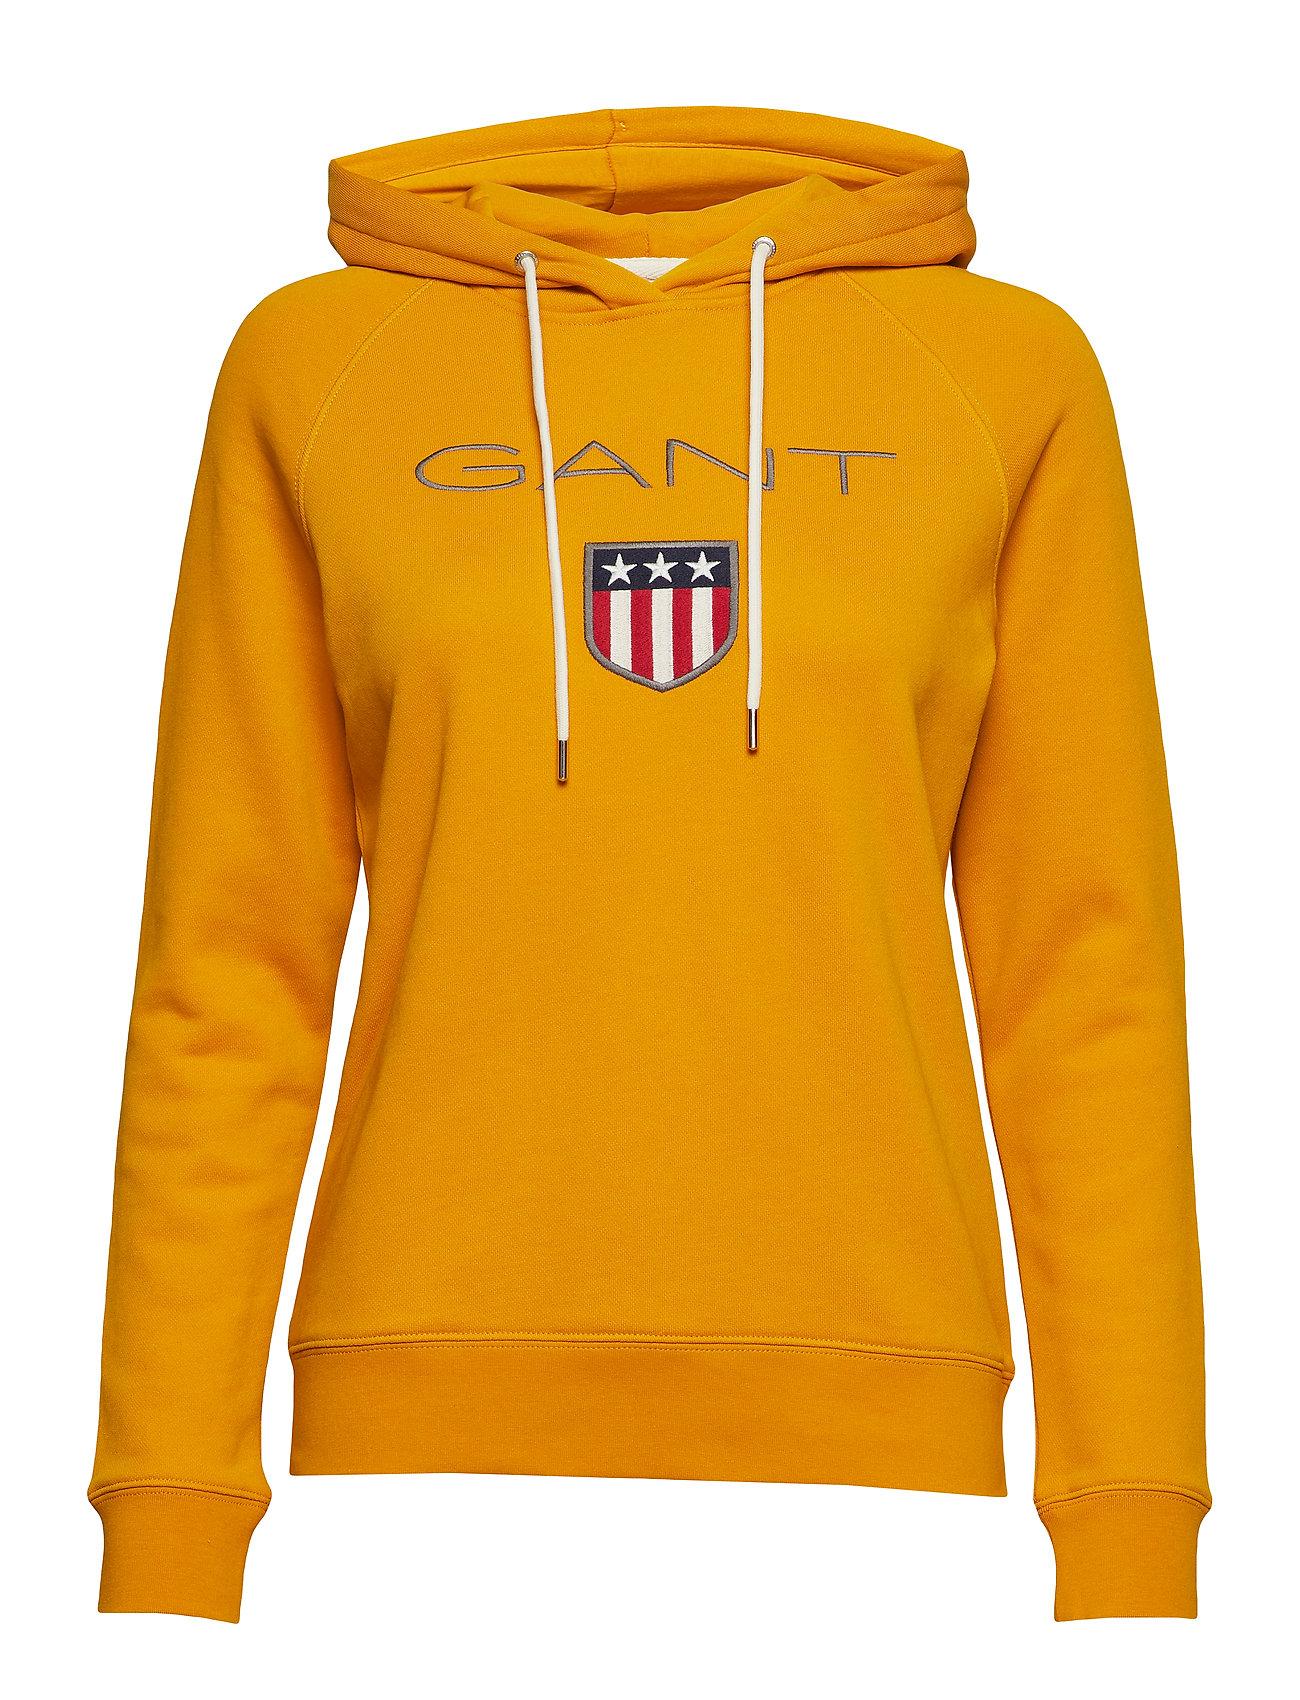 Gant GANT SHIELD SWEAT HOODIE - IVY GOLD